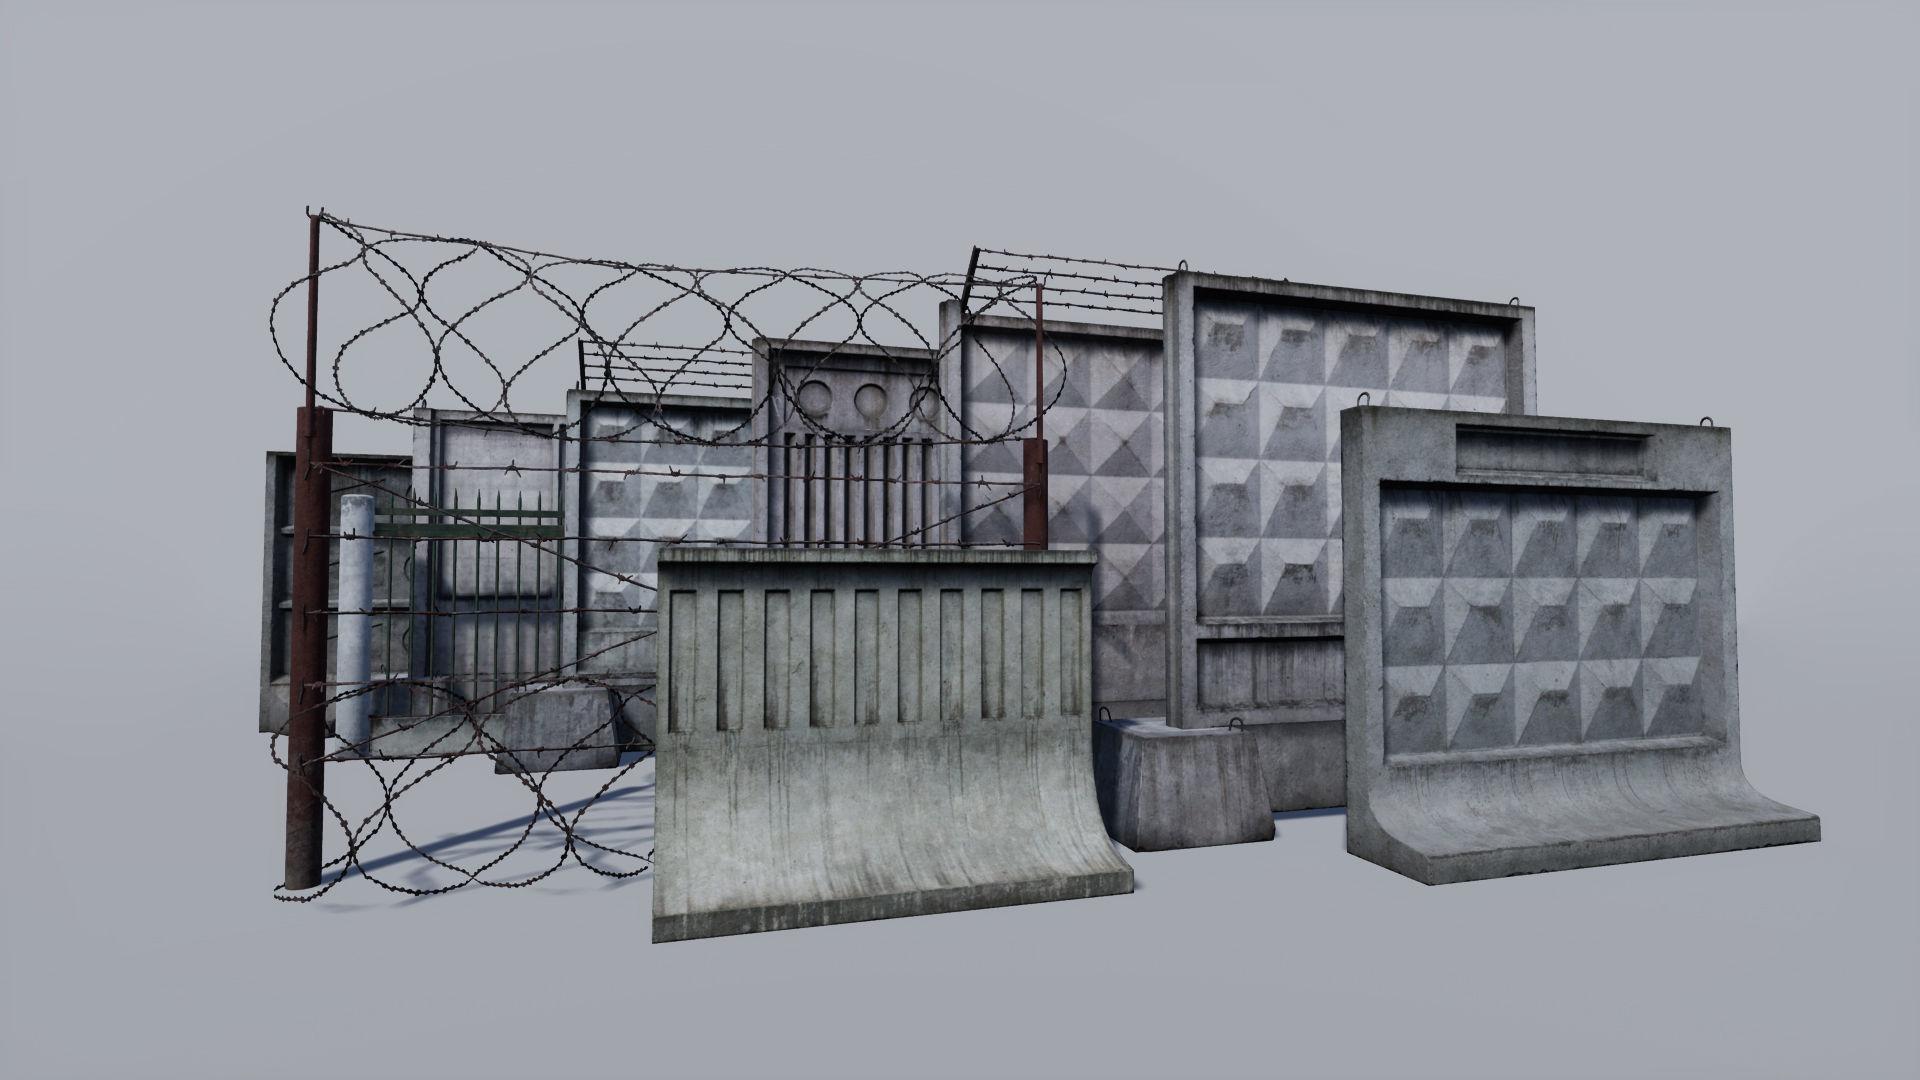 Modular concrete and metallic fences pack